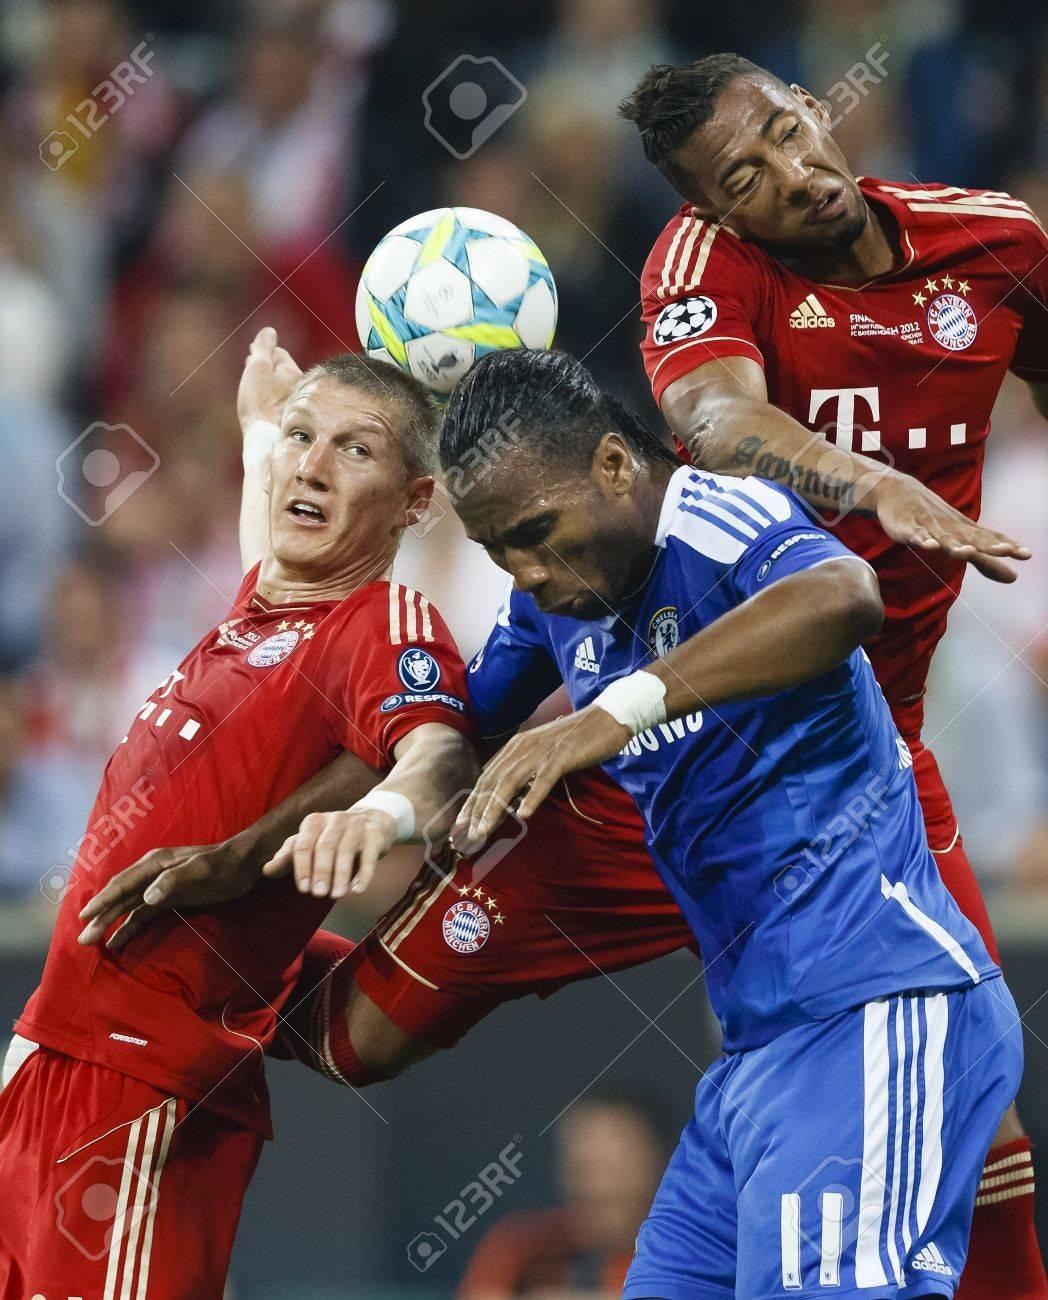 MUNICH, May 19 - Drogba of Chelsea (M) between Schweinsteiger